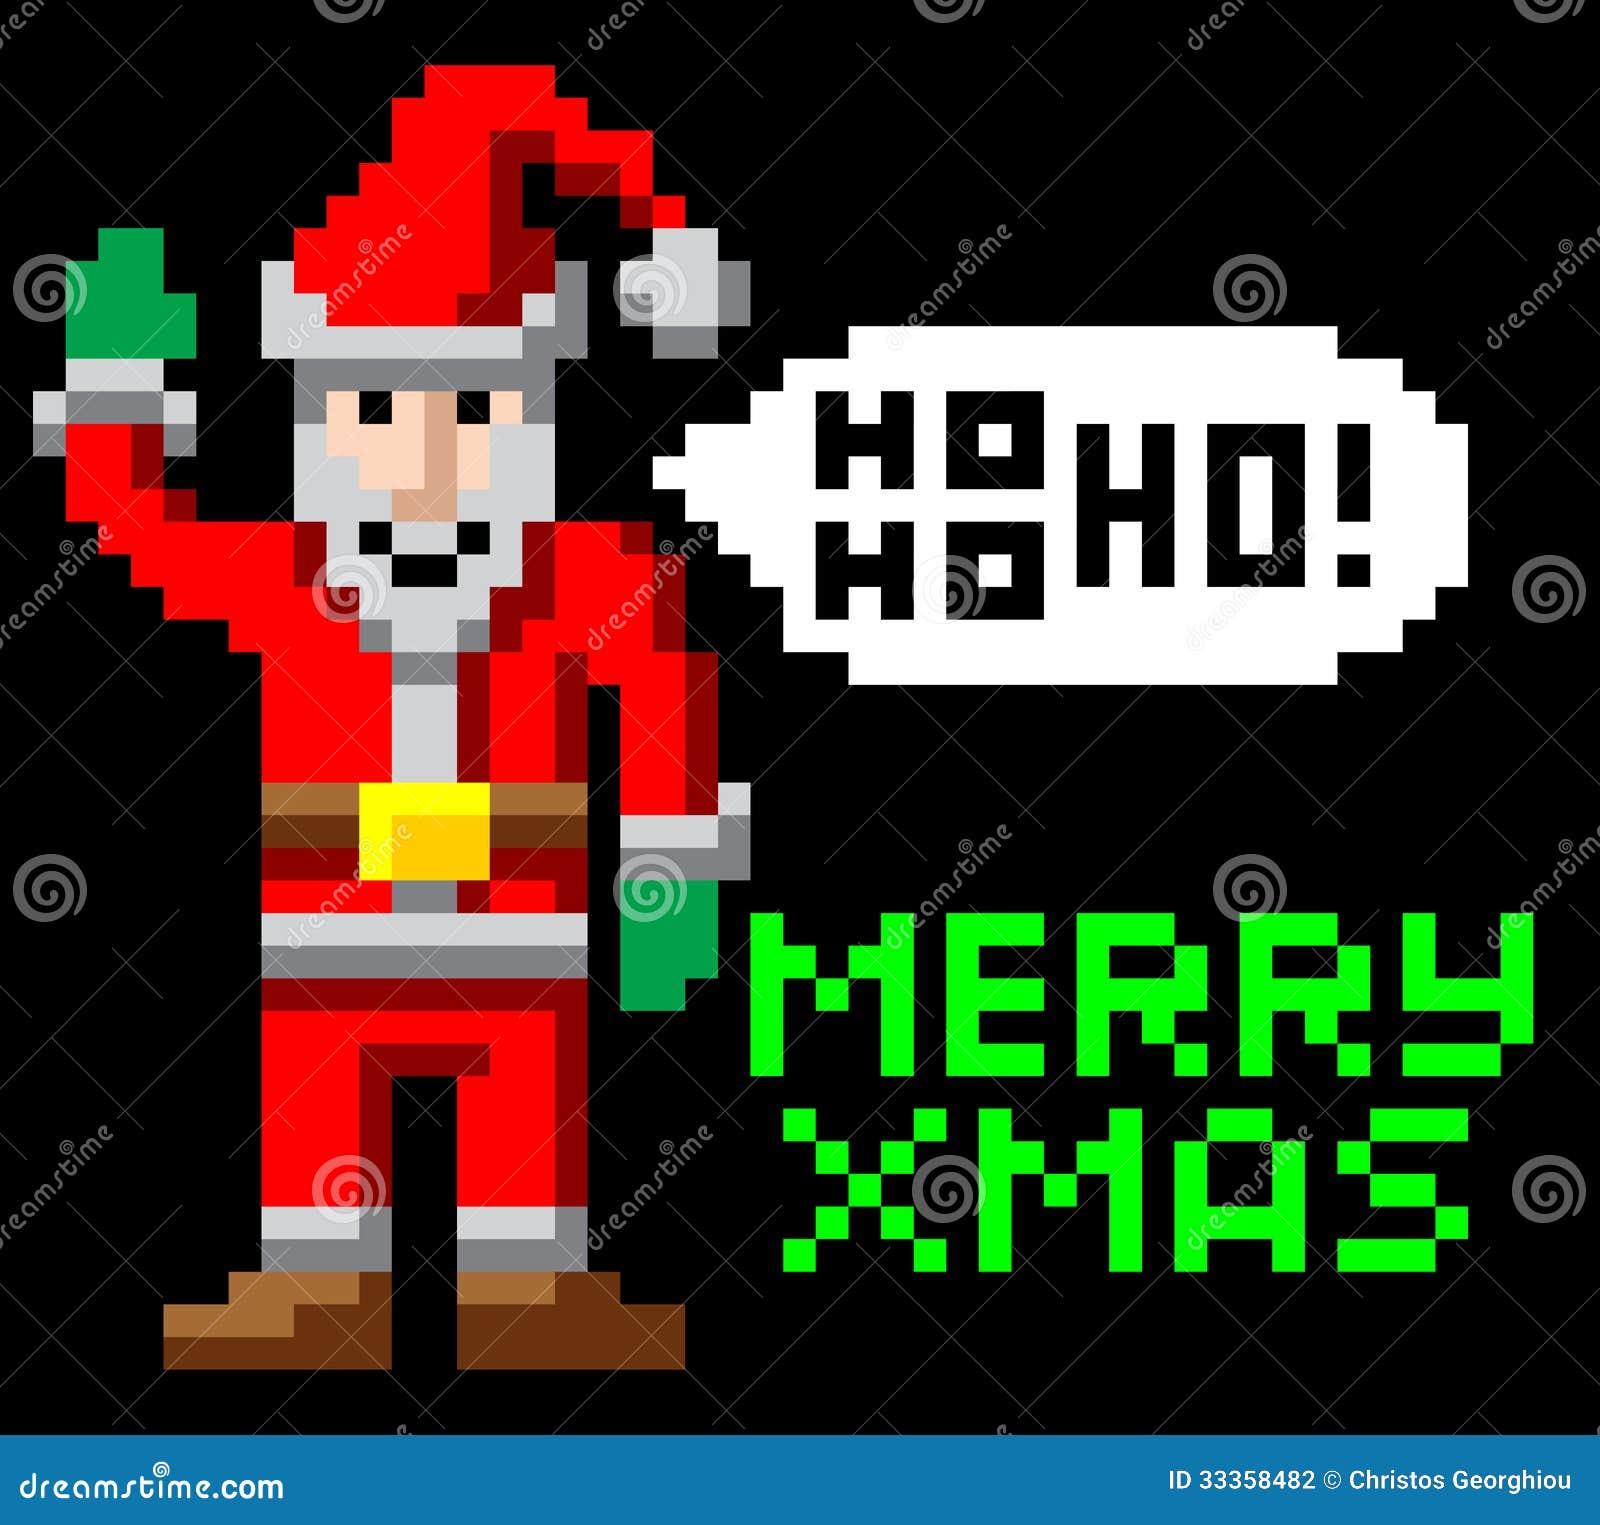 349c1ba64cd1 Retro Pixel Art Christmas Santa Stock Vector - Illustration of icon ...